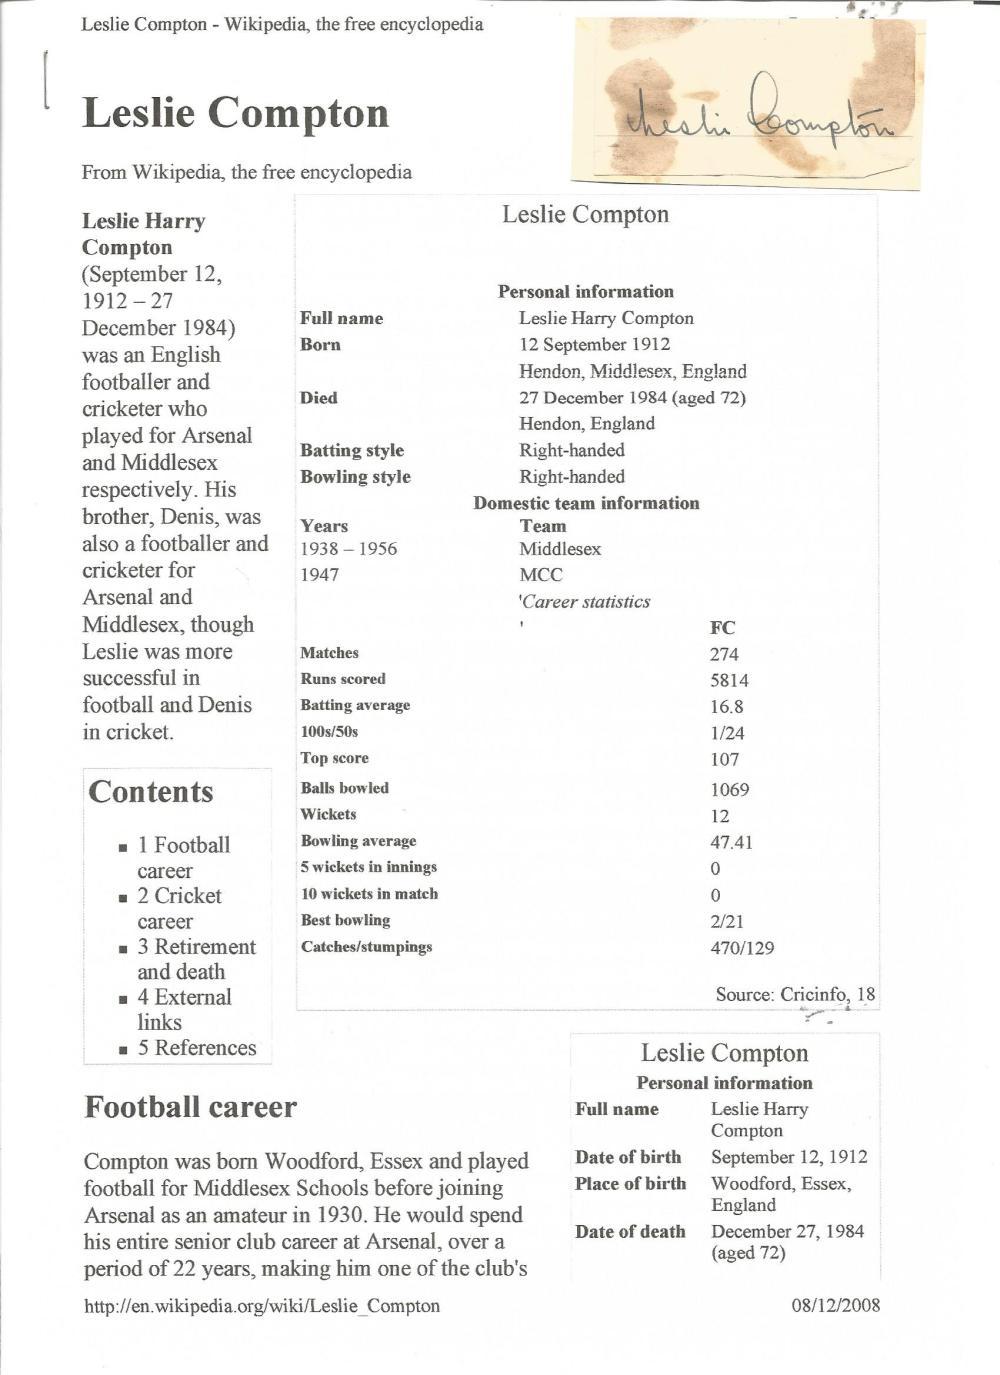 Cricket Les Compton signed 3x2 vintage album page. Leslie Harry Compton (12 September 1912 - 27